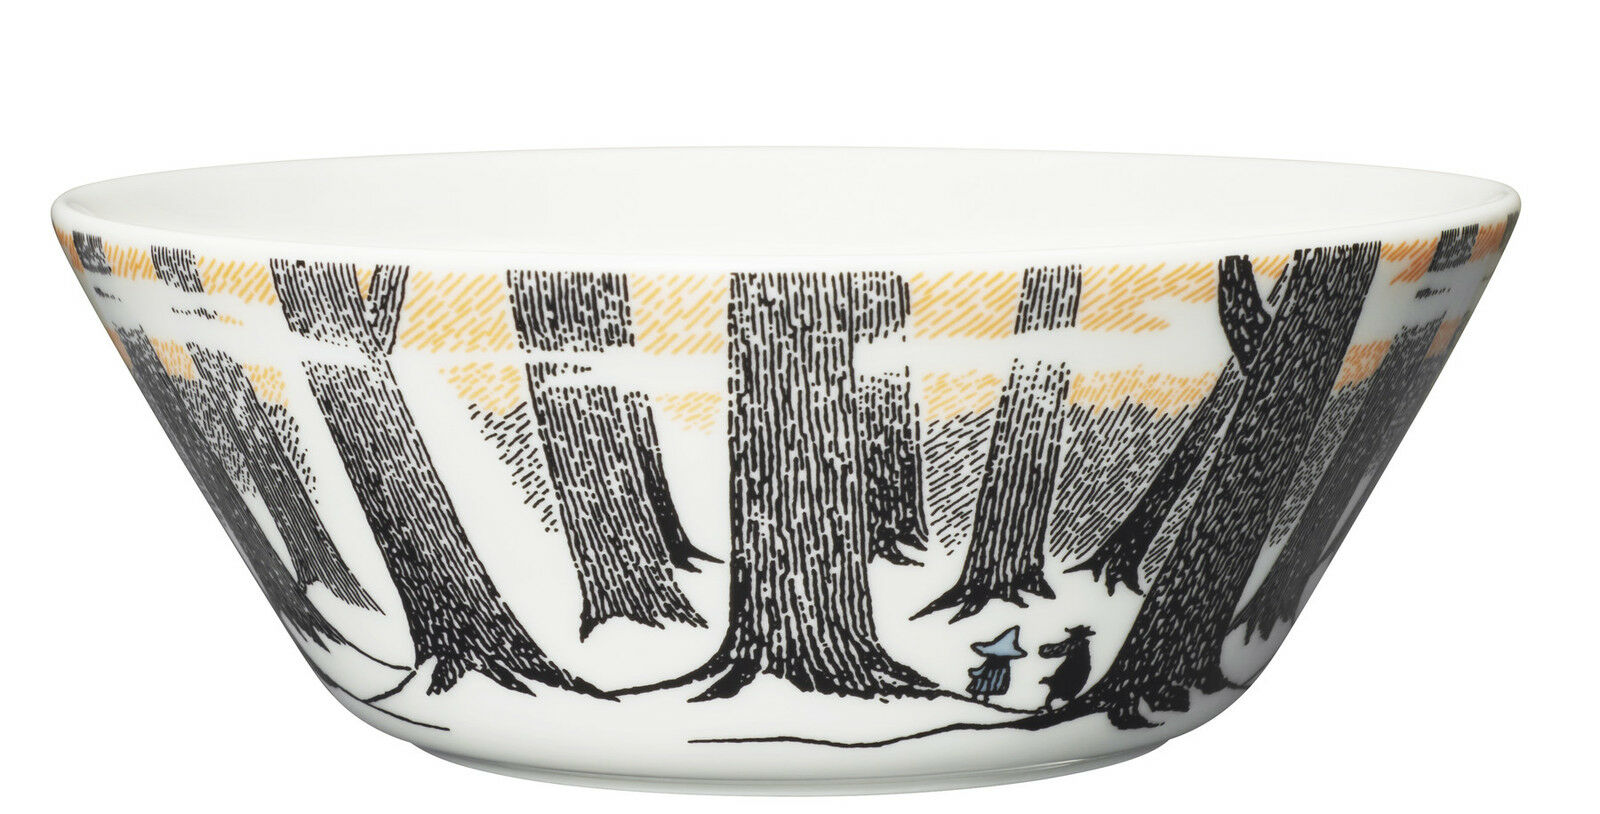 Moomin Bowl True to Its Origins 15 cm Arabia